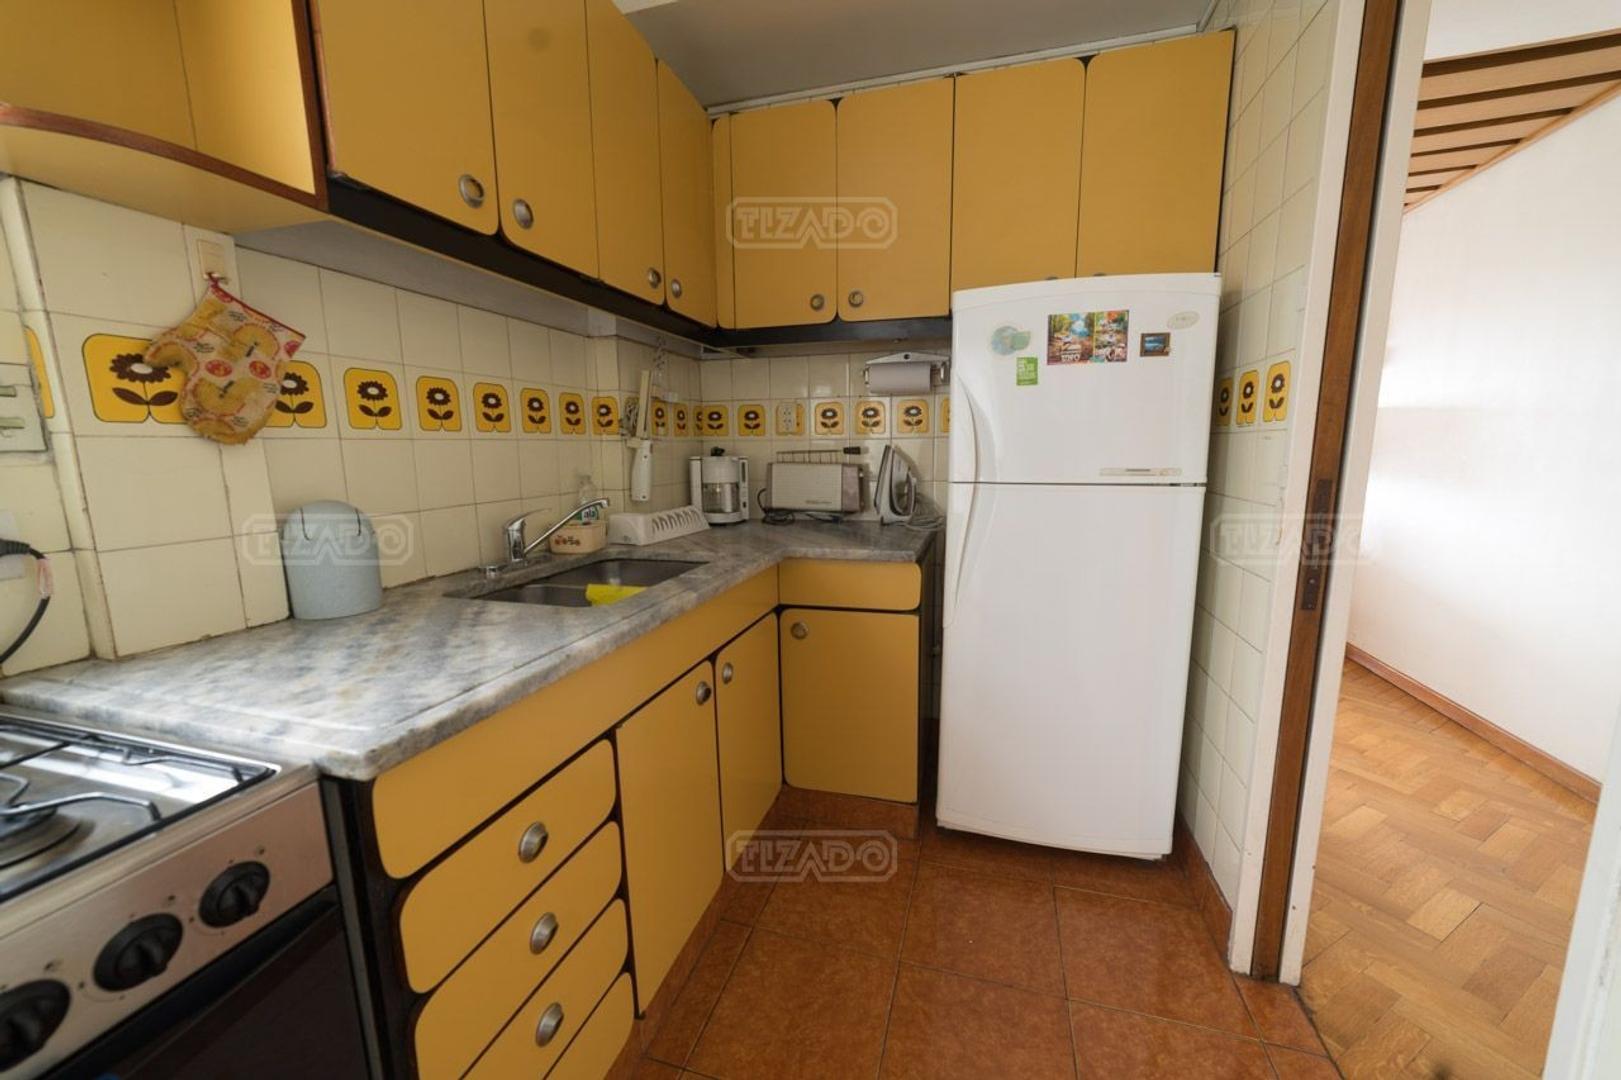 Departamento Semipiso  en Venta ubicado en Caballito, Capital Federal - CAB1303_LP220737_1 - Foto 28